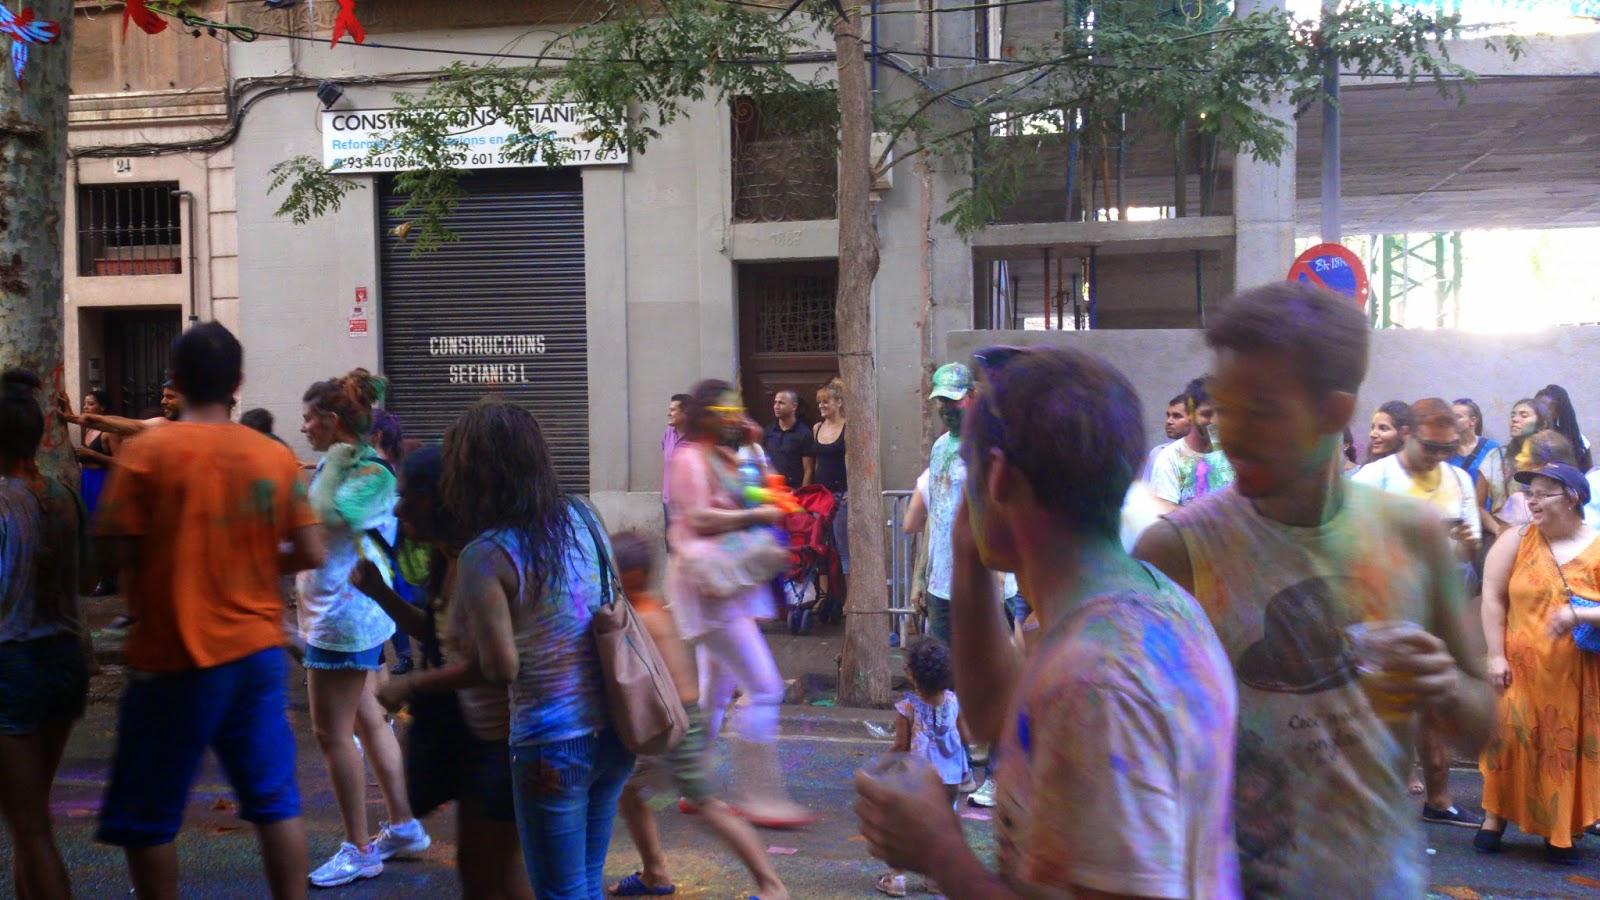 fiesta Holi en las fiestas de Sants